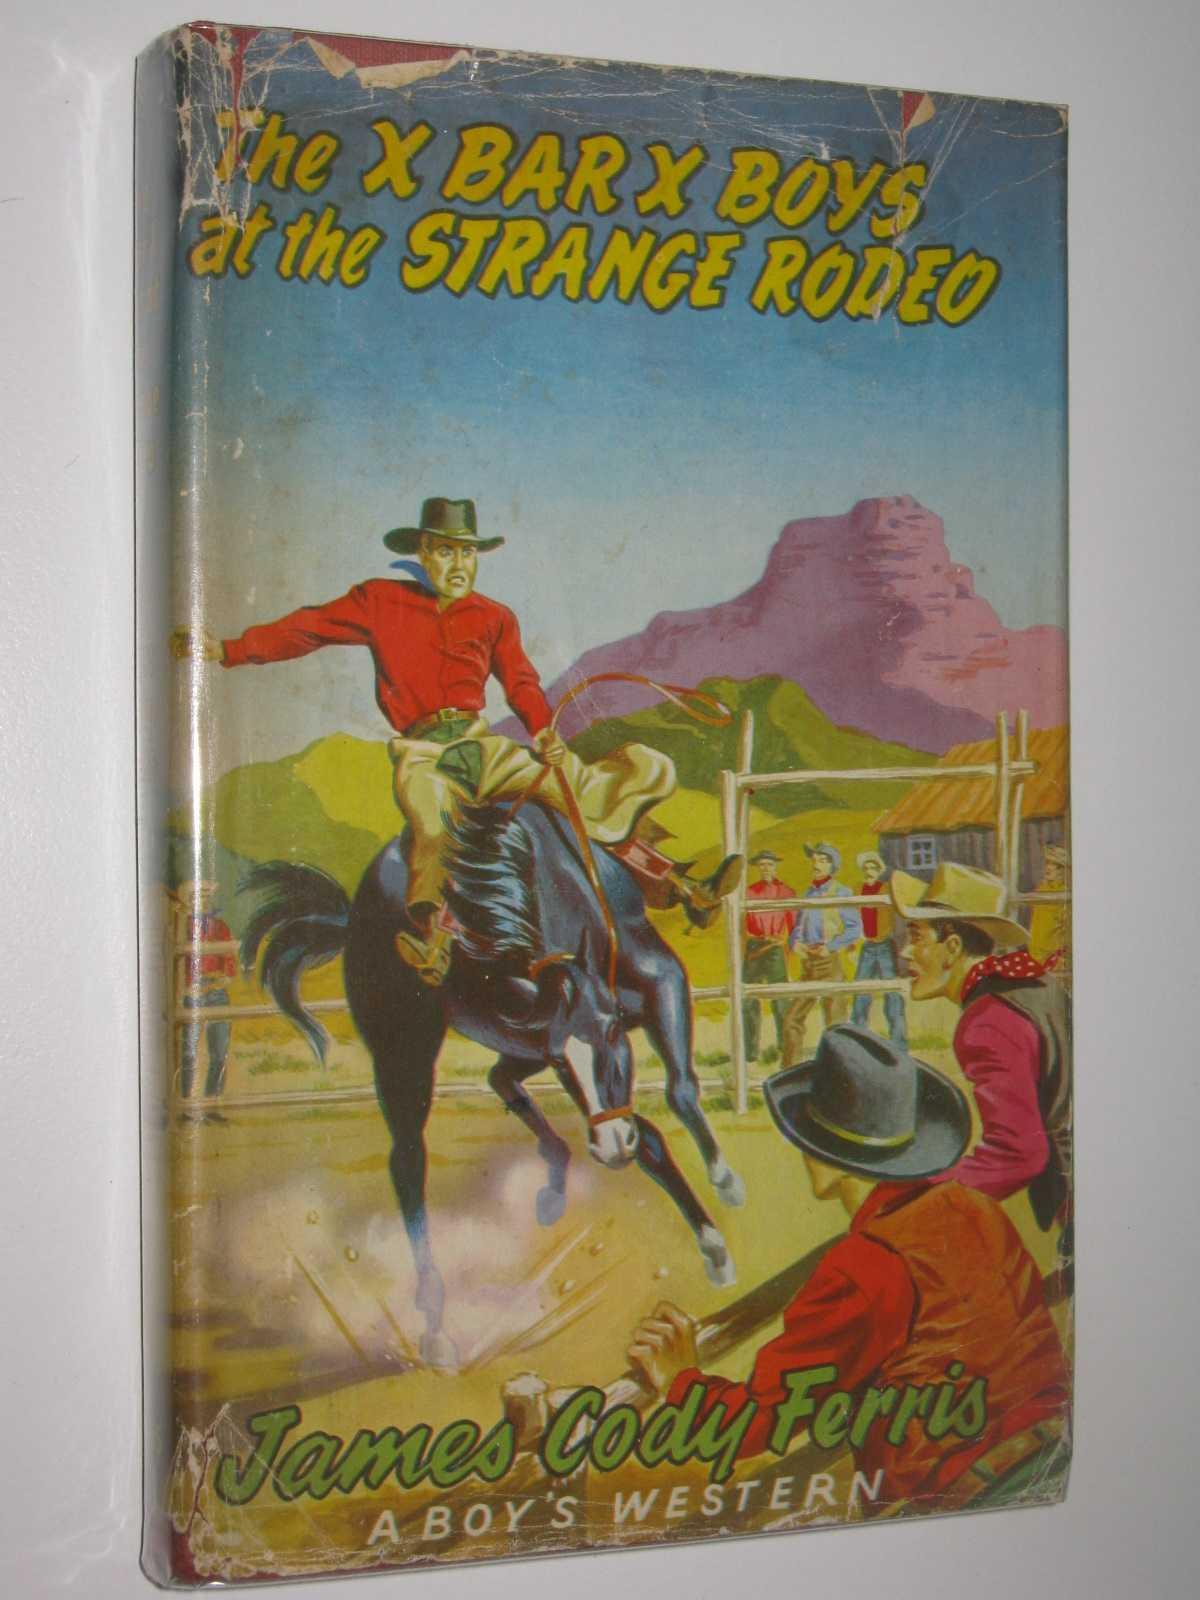 The X Bar X Boys at the Strange Rodeo, Ferris, James Cody